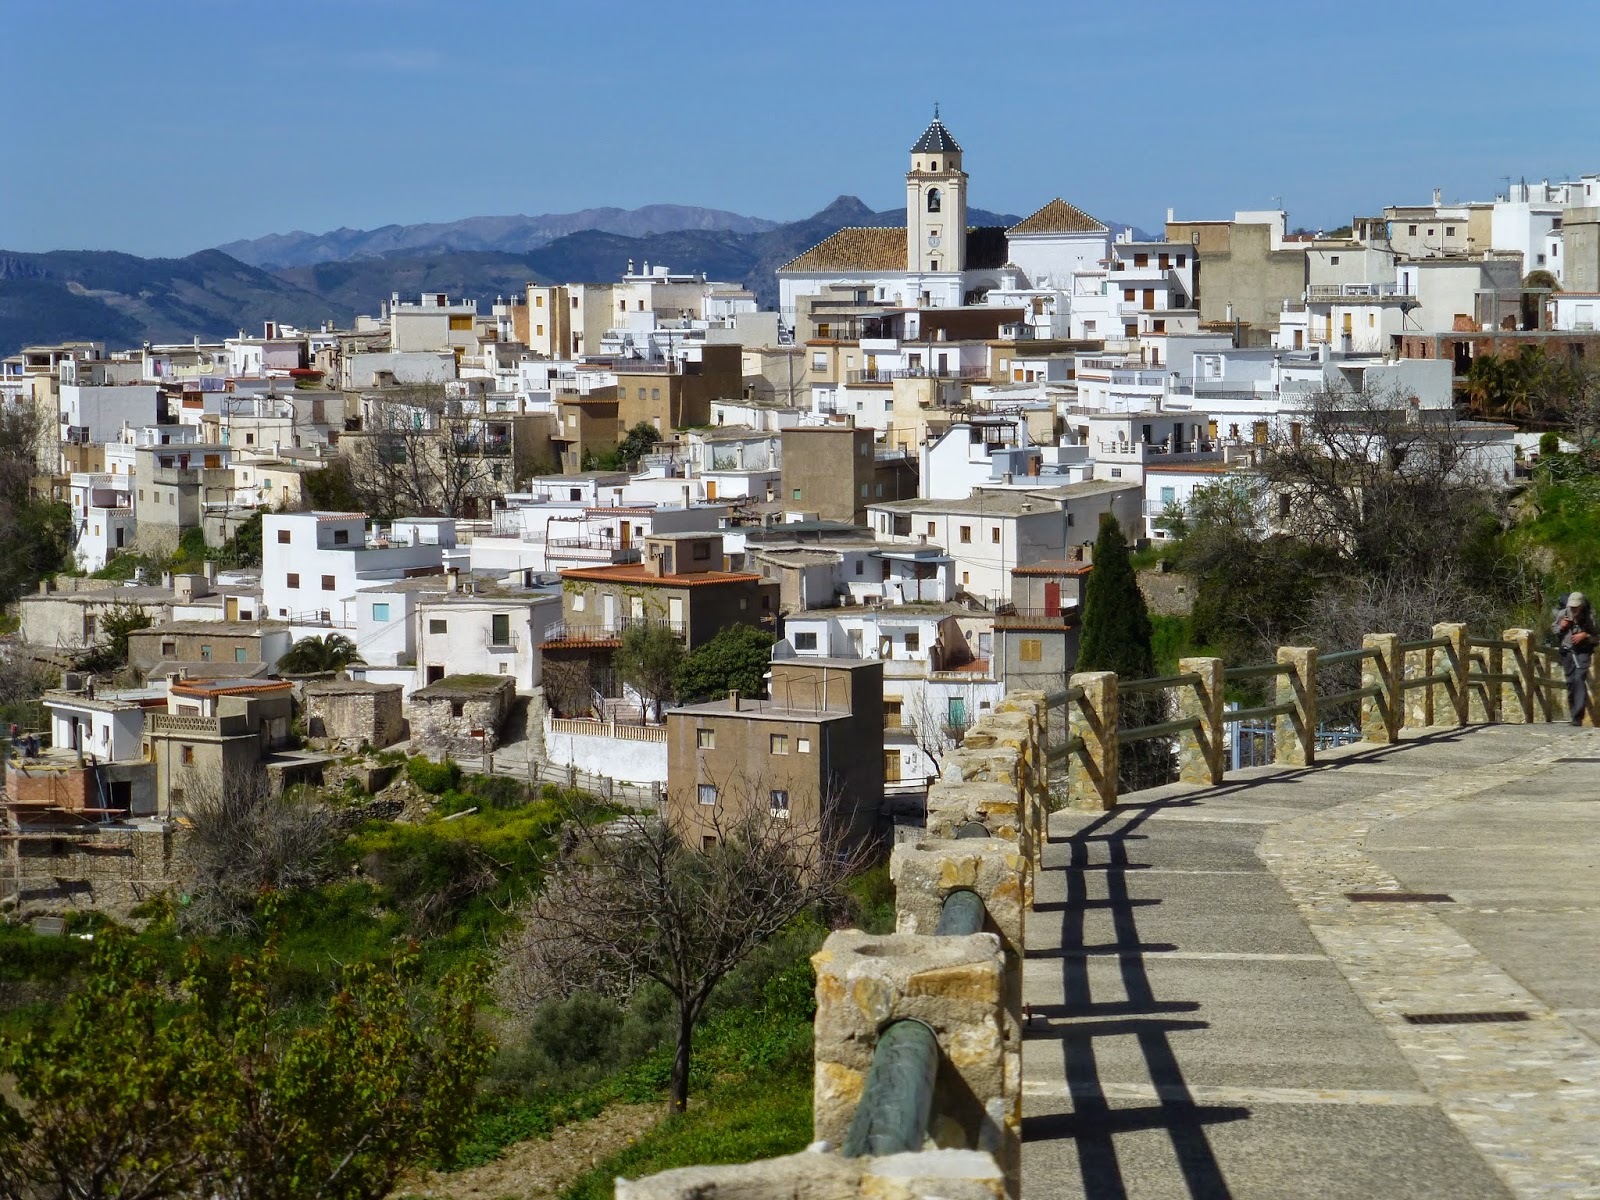 Lanjaron Spain  city photos gallery : Walking in the Alpujarras, Spain: Lanjaron to Bubion